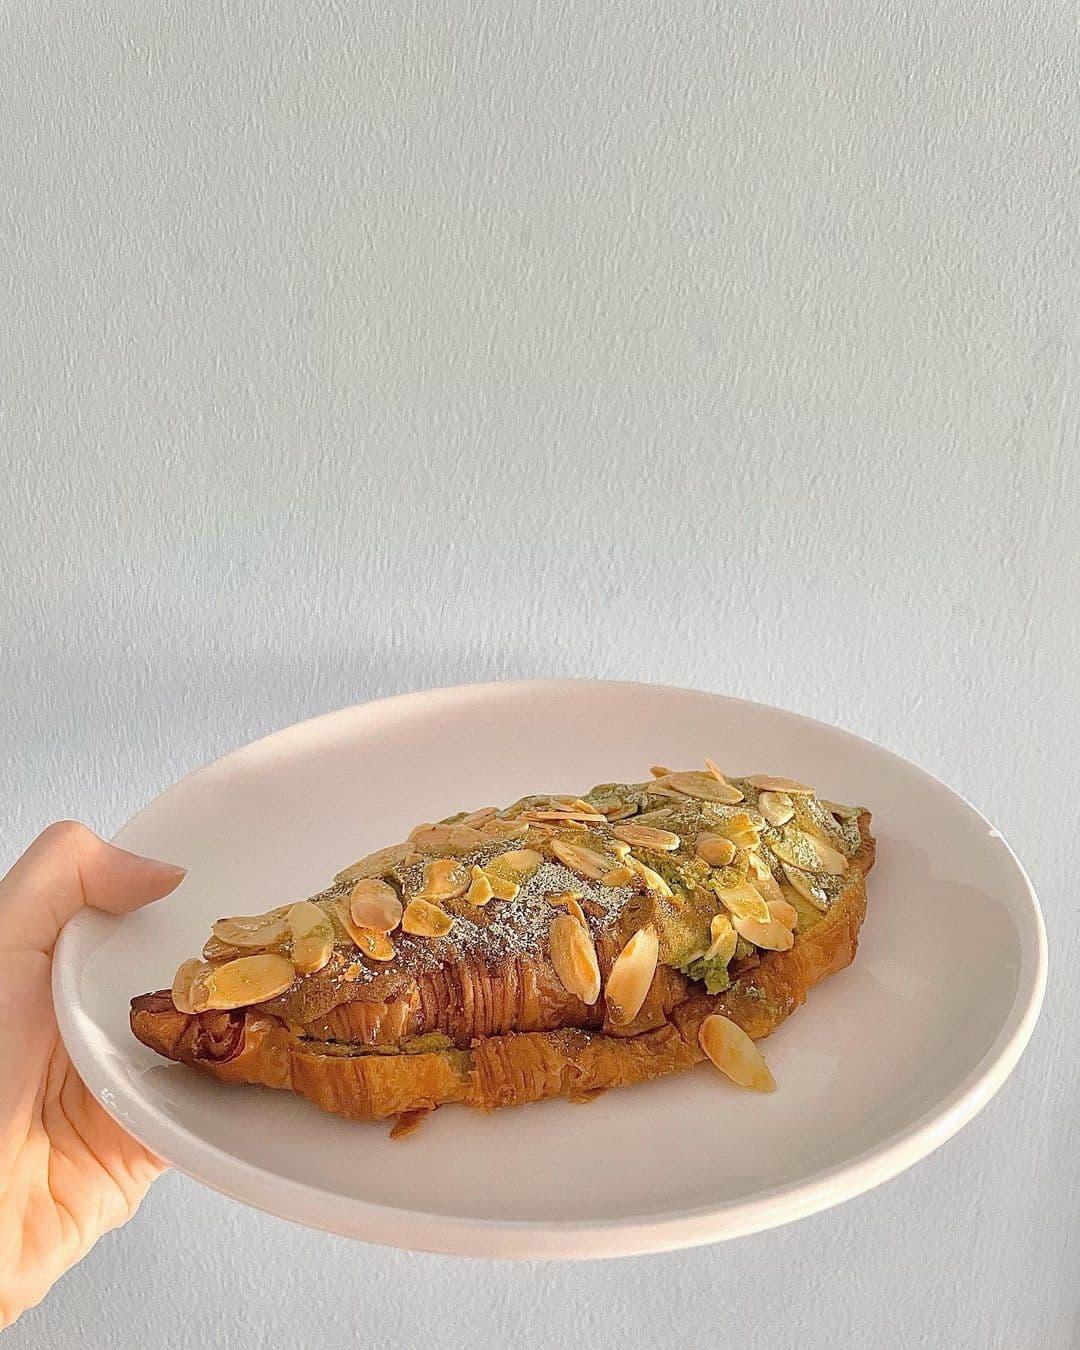 tiong bahru bakery - green tea almond croissant